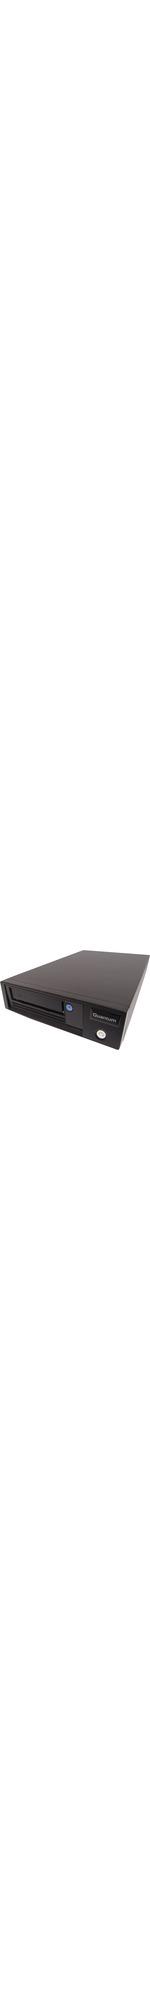 Quantum LTO-6 Tape Drive - 2.50 TB Native/6.25 TB Compressed - SAS - 1/2H Height - Tabletop